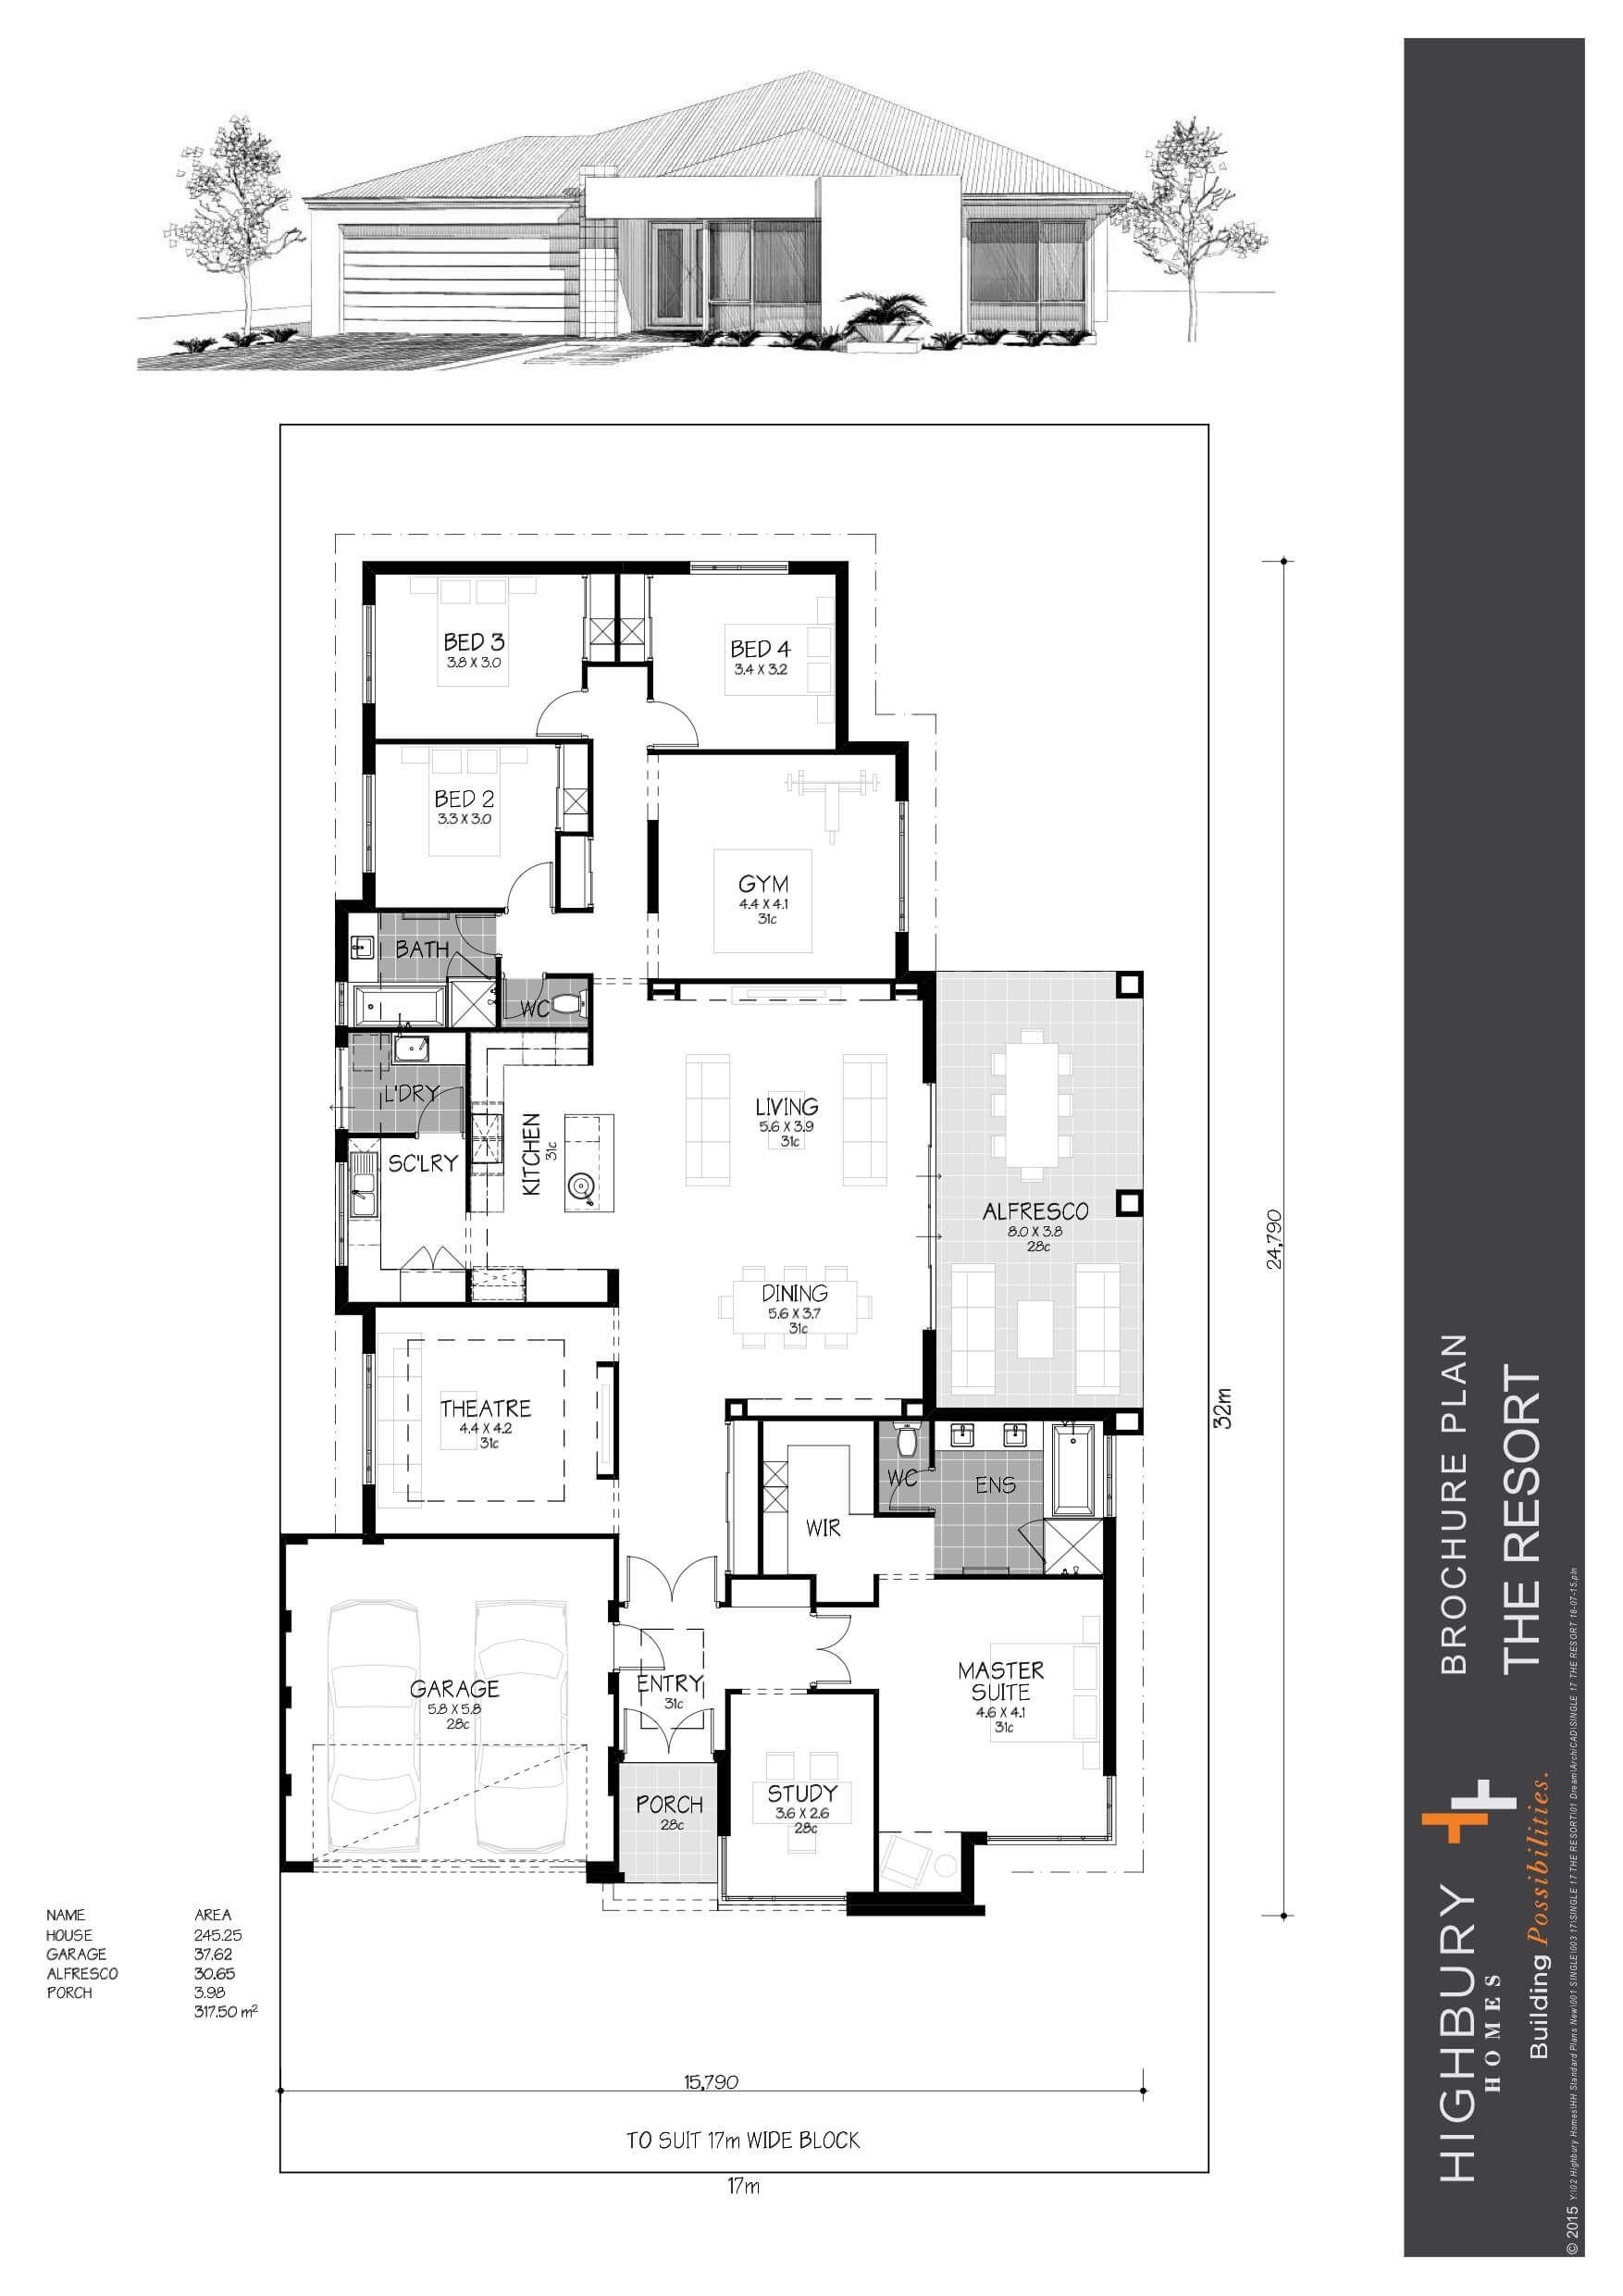 Home Floorplan The Resort Best Small House Designs House Map Small House Design